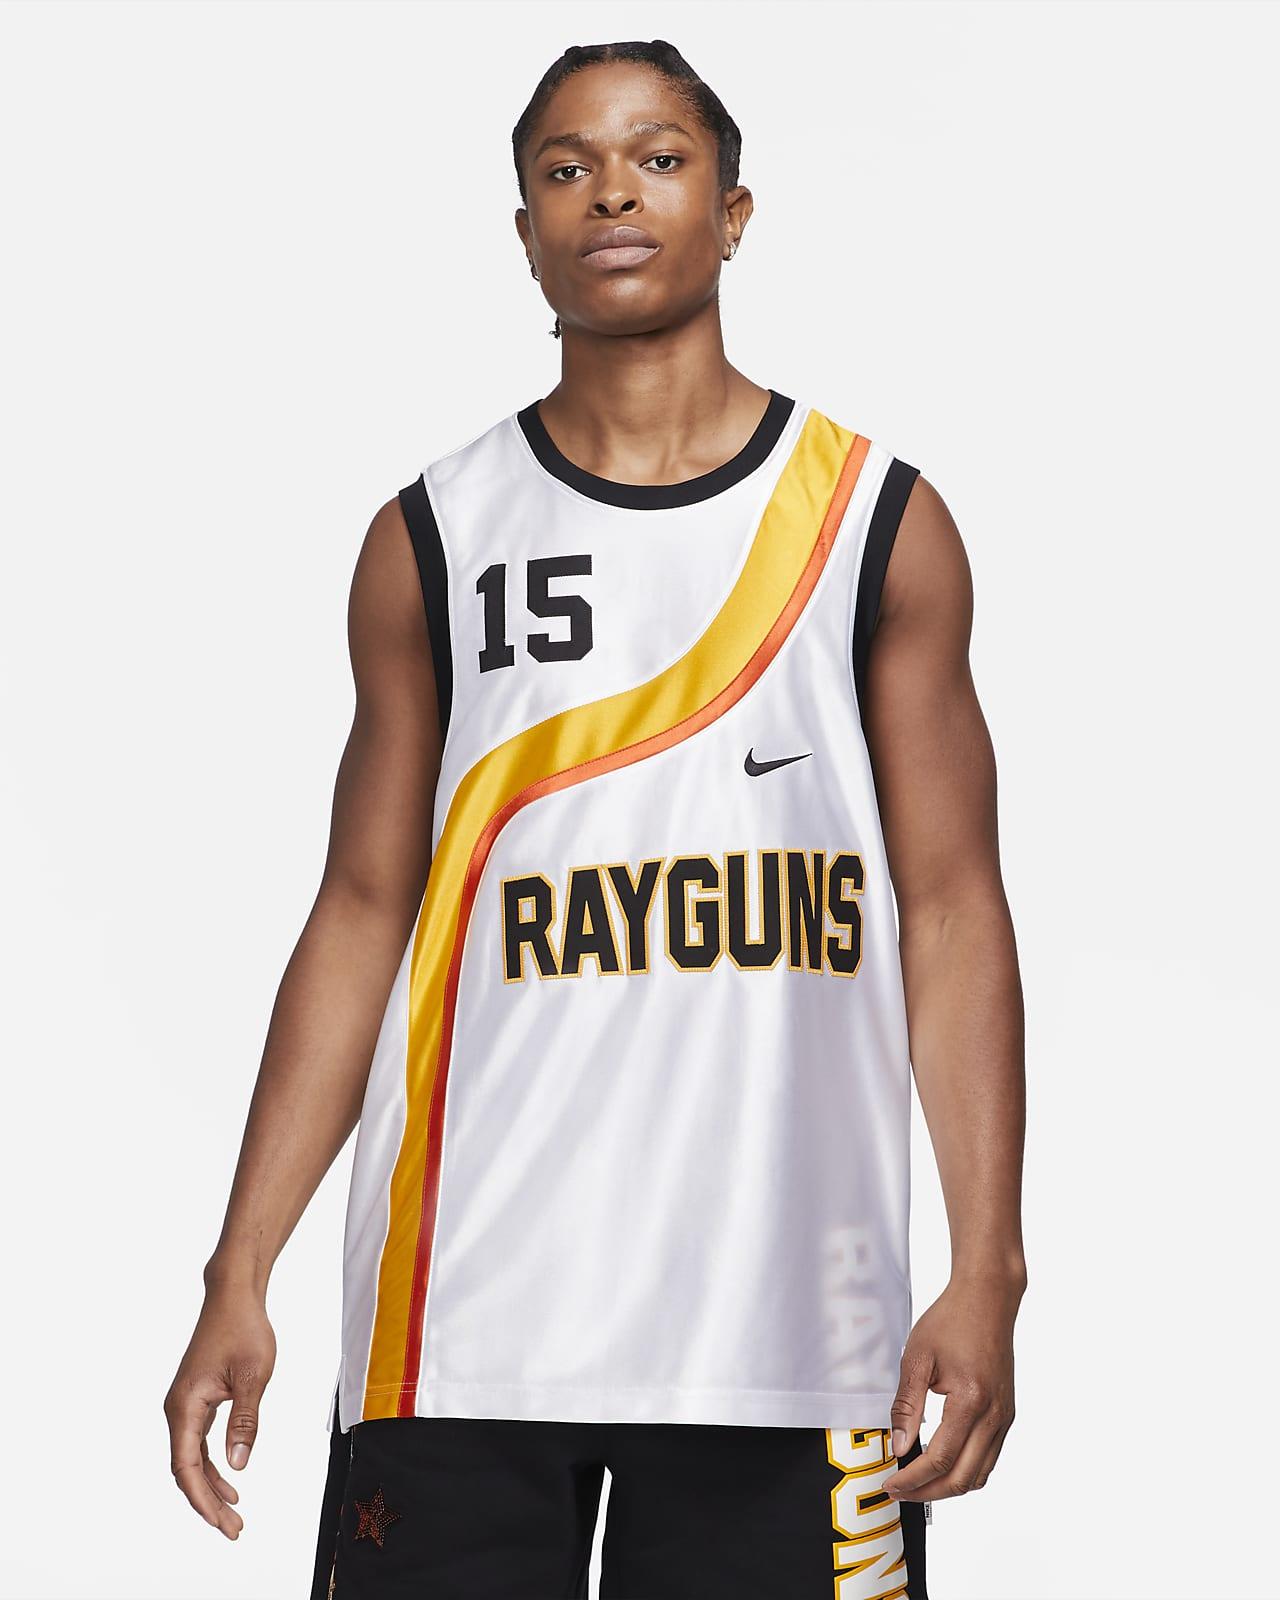 Maglia da basket Premium Nike Rayguns - Uomo